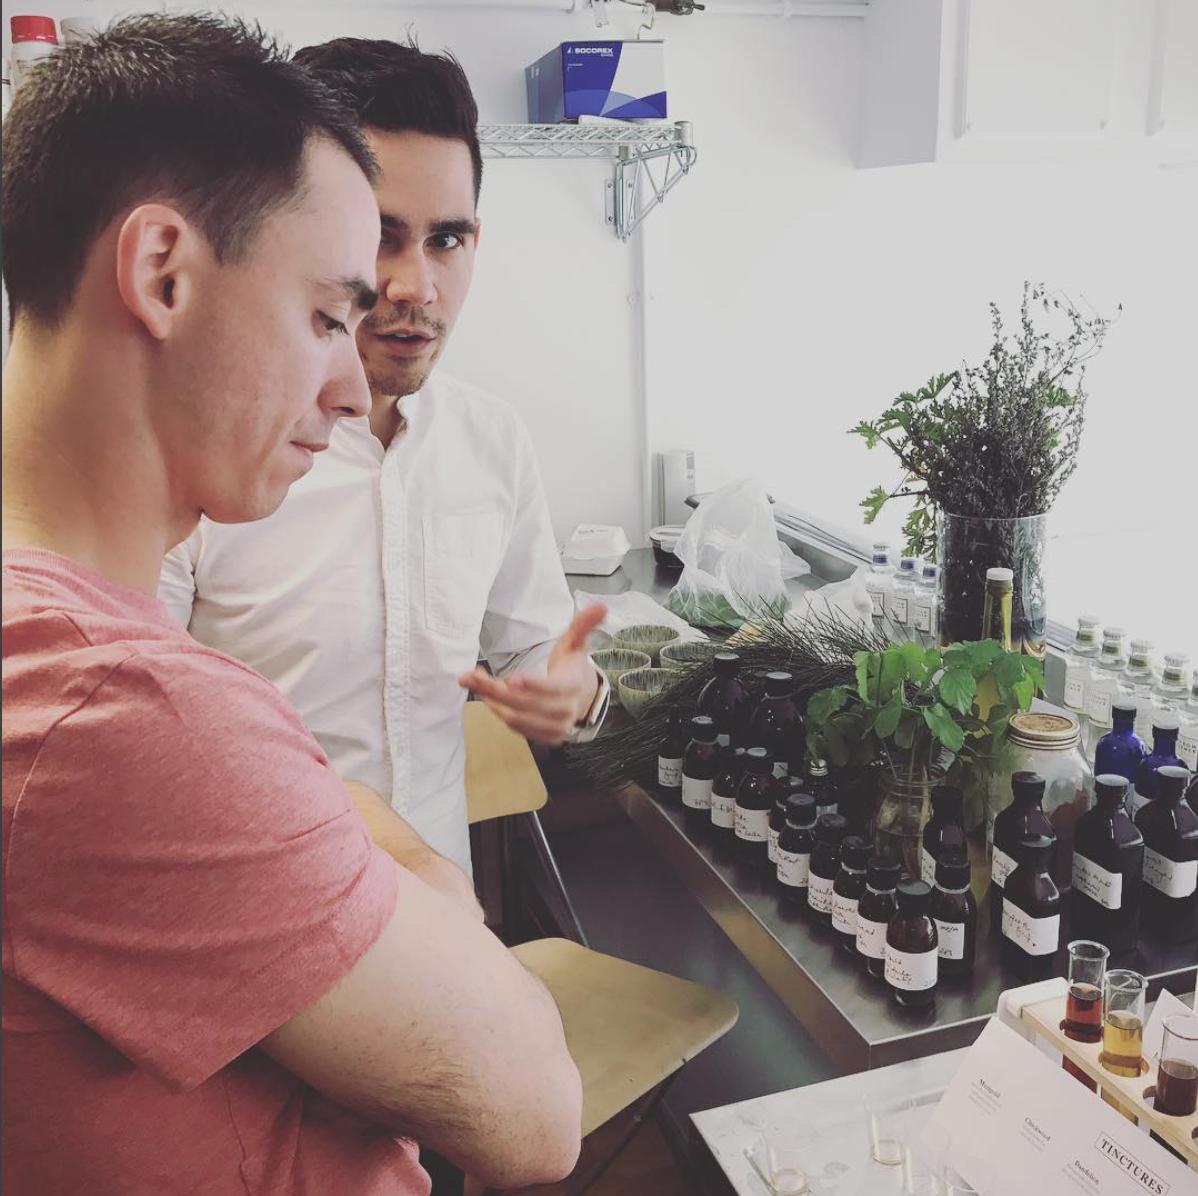 Elixirs, potions & mixologists